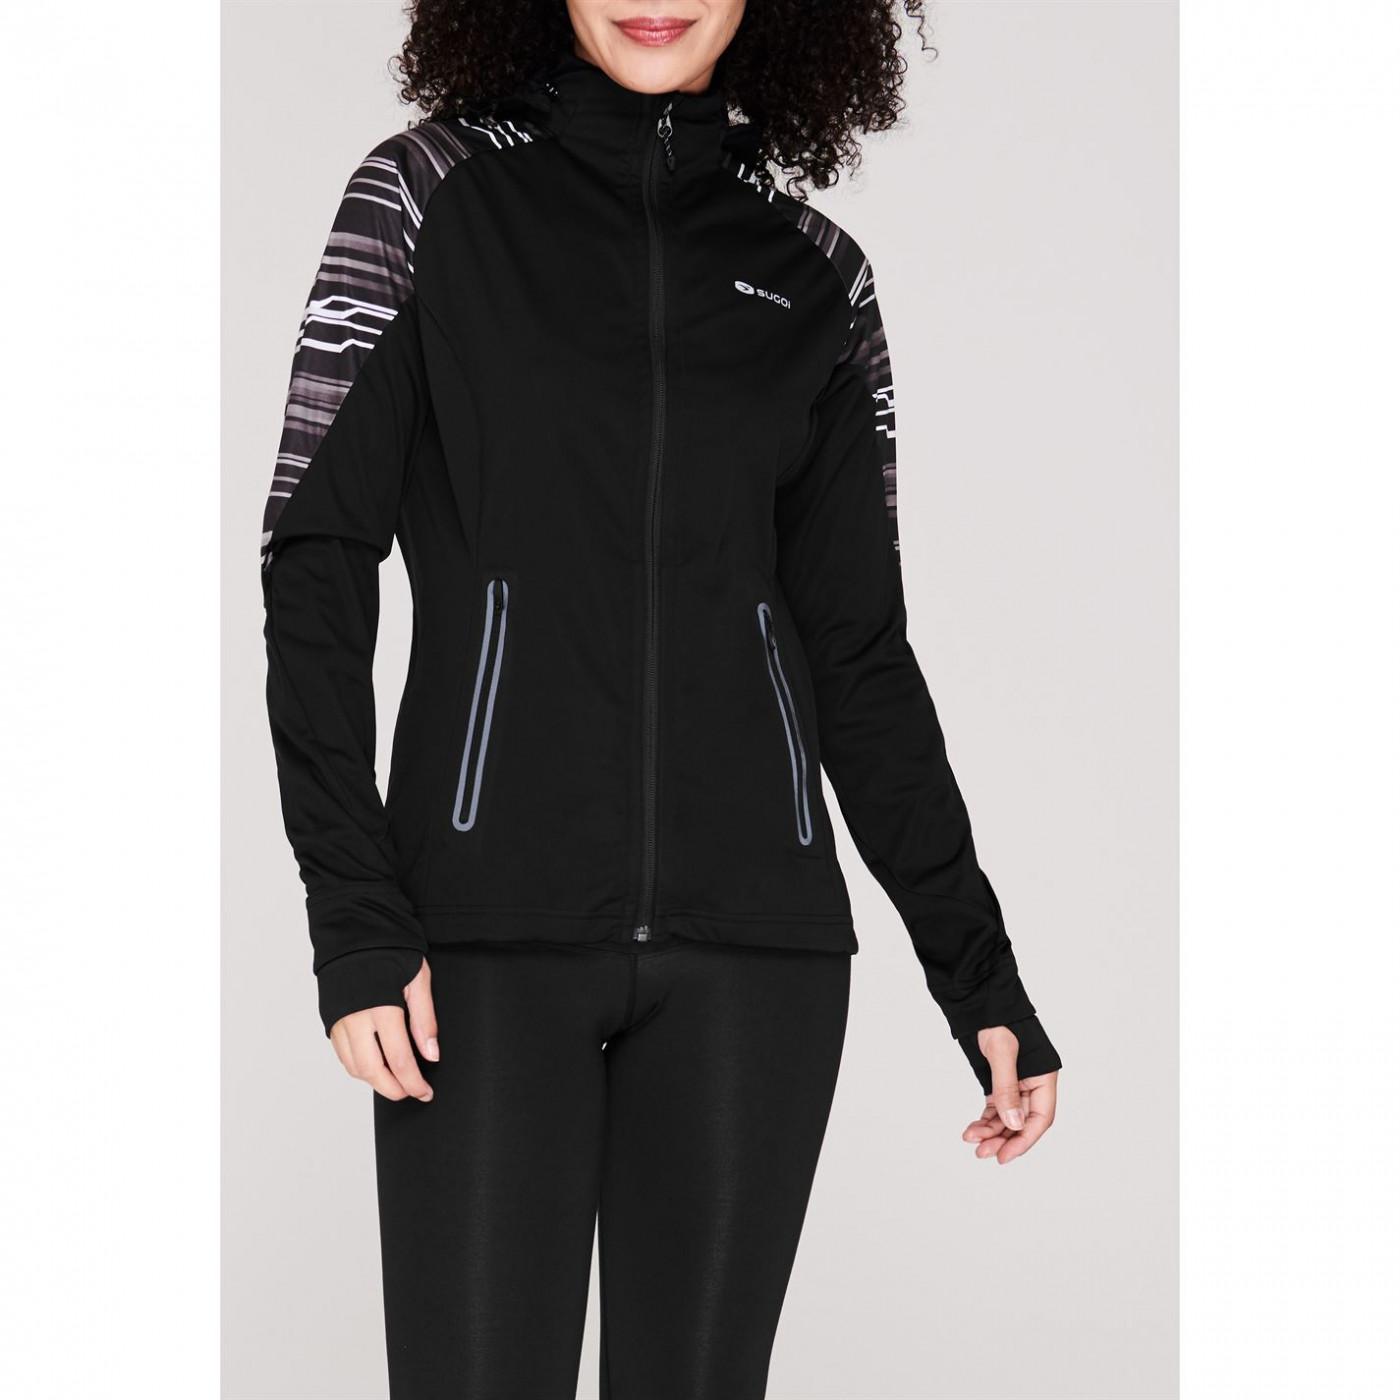 Sugoi Firewall 180 Cycling Jacket Ladies